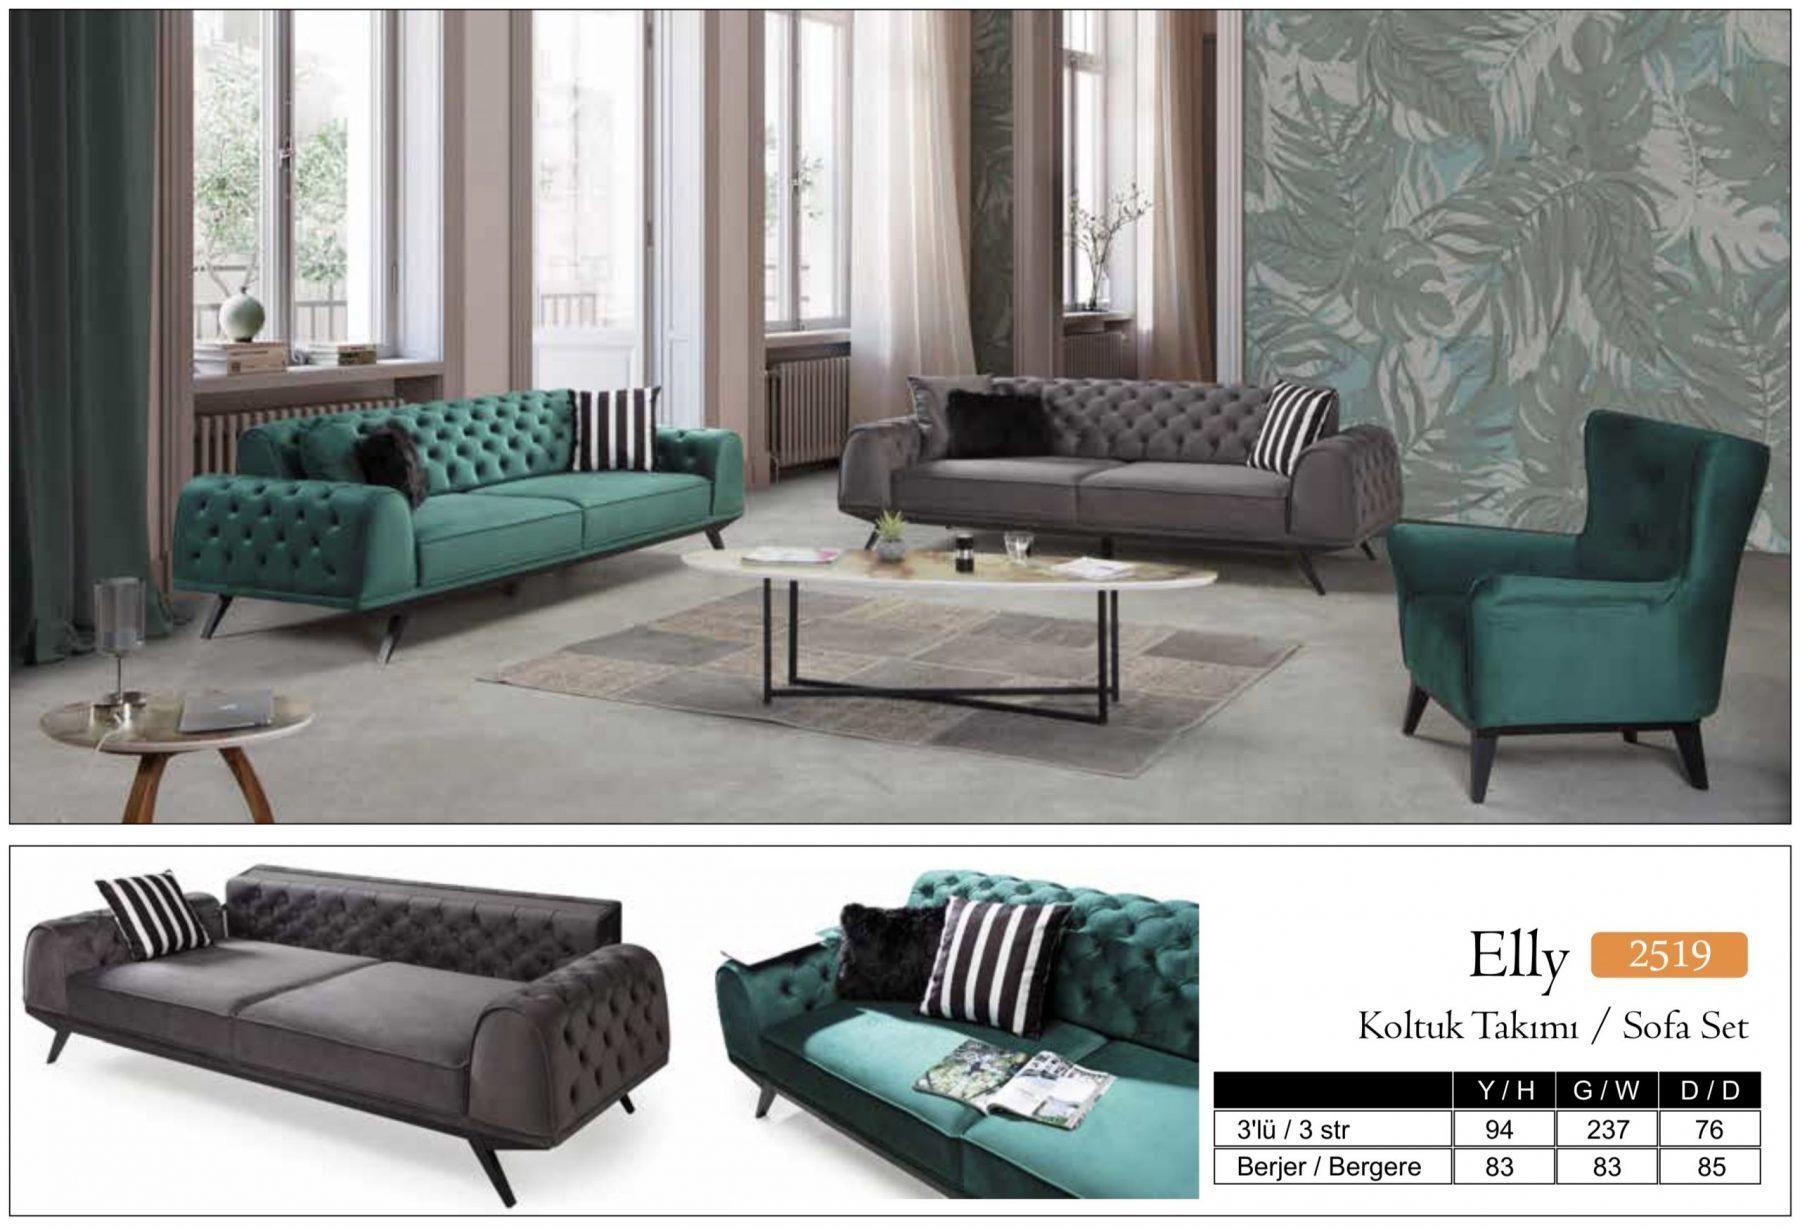 Godina Elly 2519 Living Room Modern Sofa Set Home Furniture Wholesale Export Turkey In 2020 Modern Sofa Set Modern Room Living Room Sofa Set